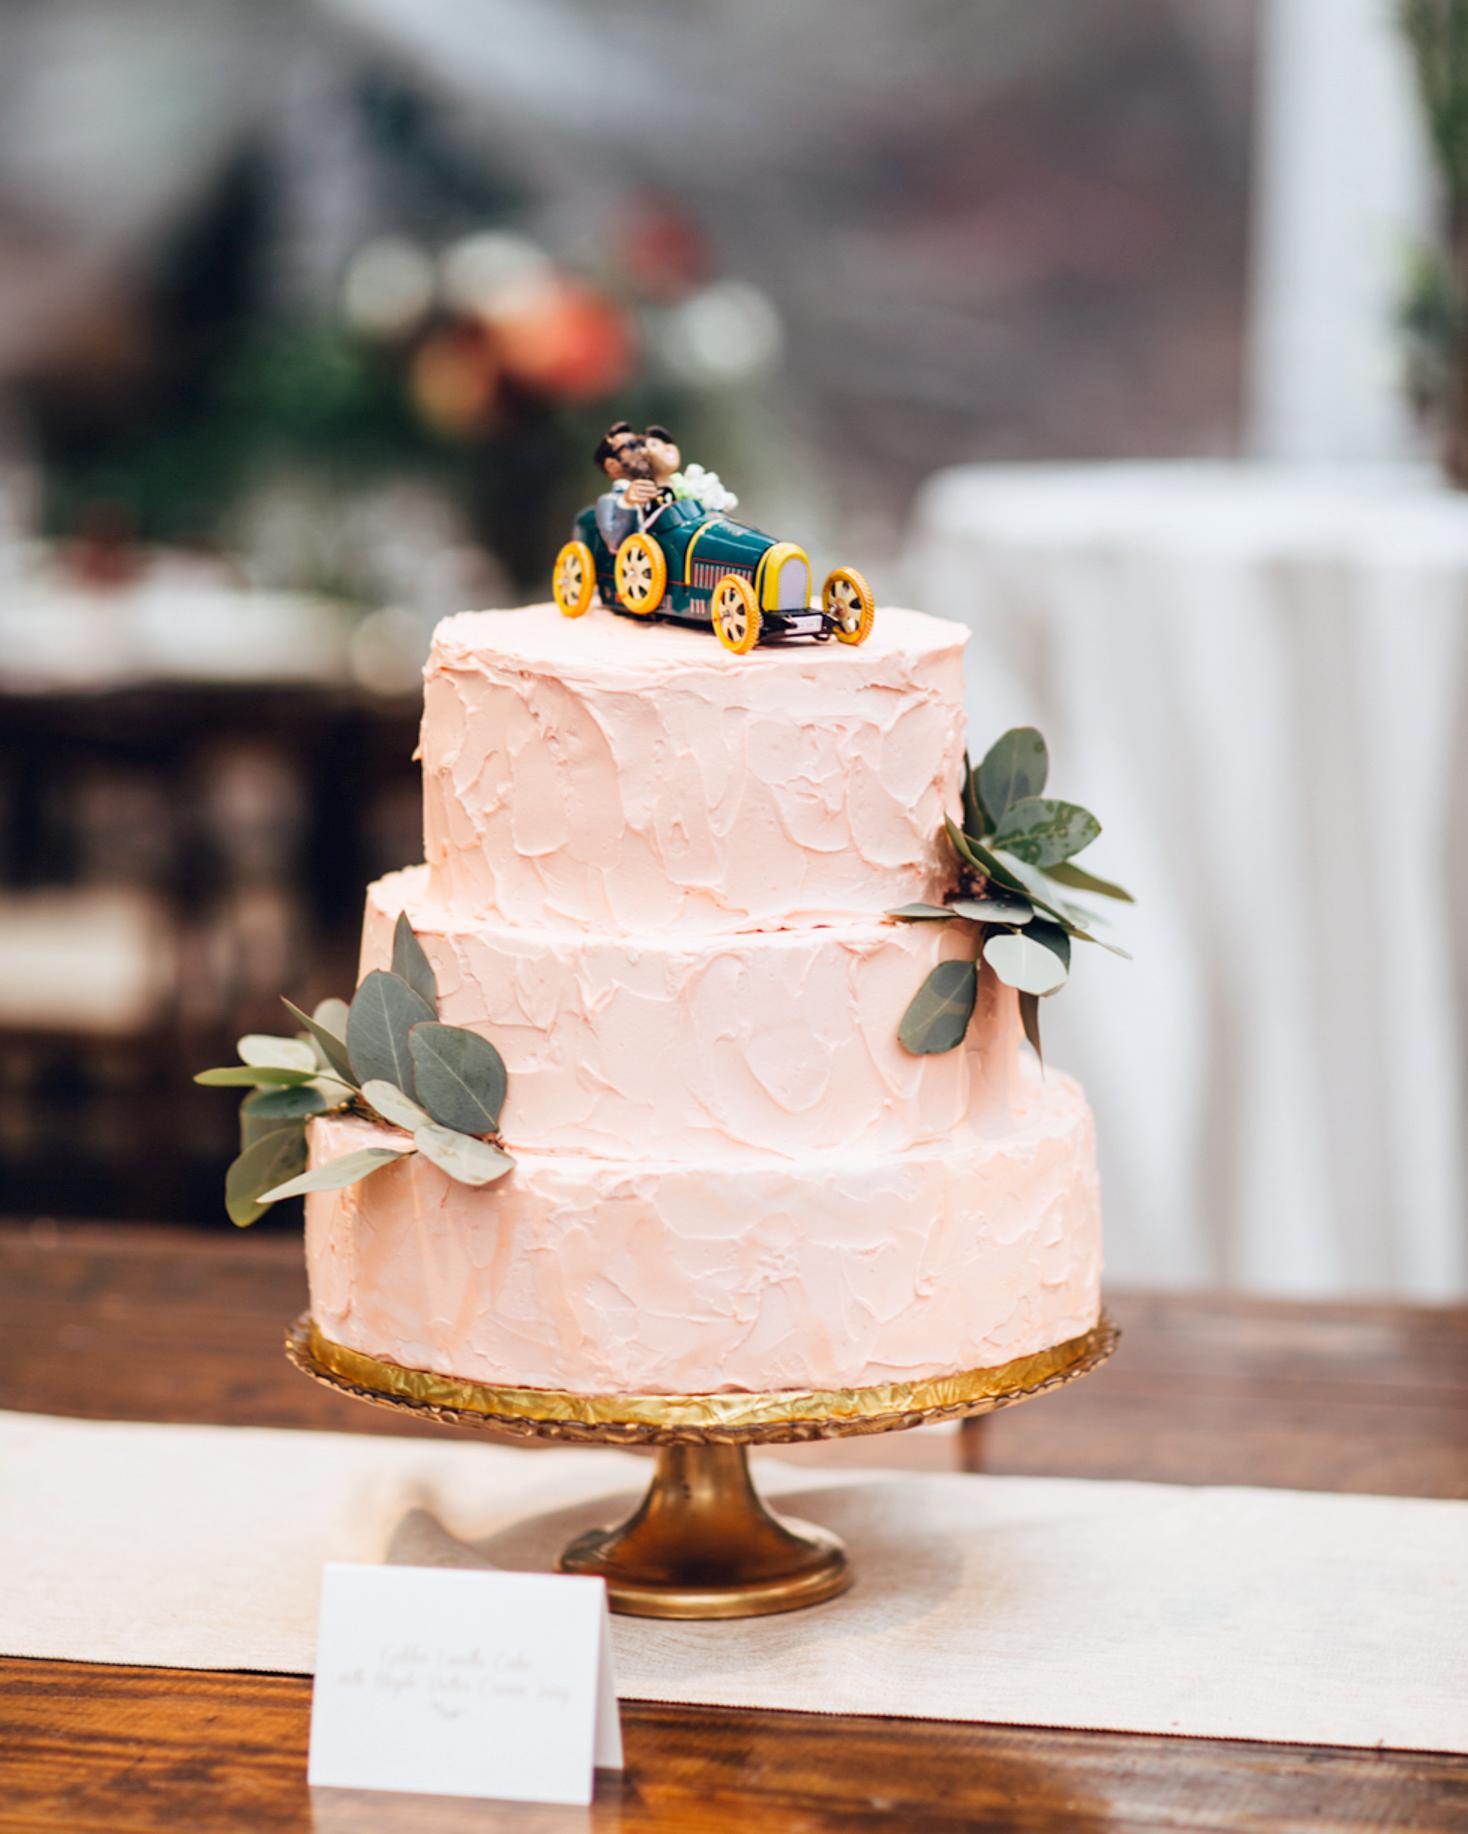 thea-rachit-wedding-cake-0781-s112016-0715.jpg